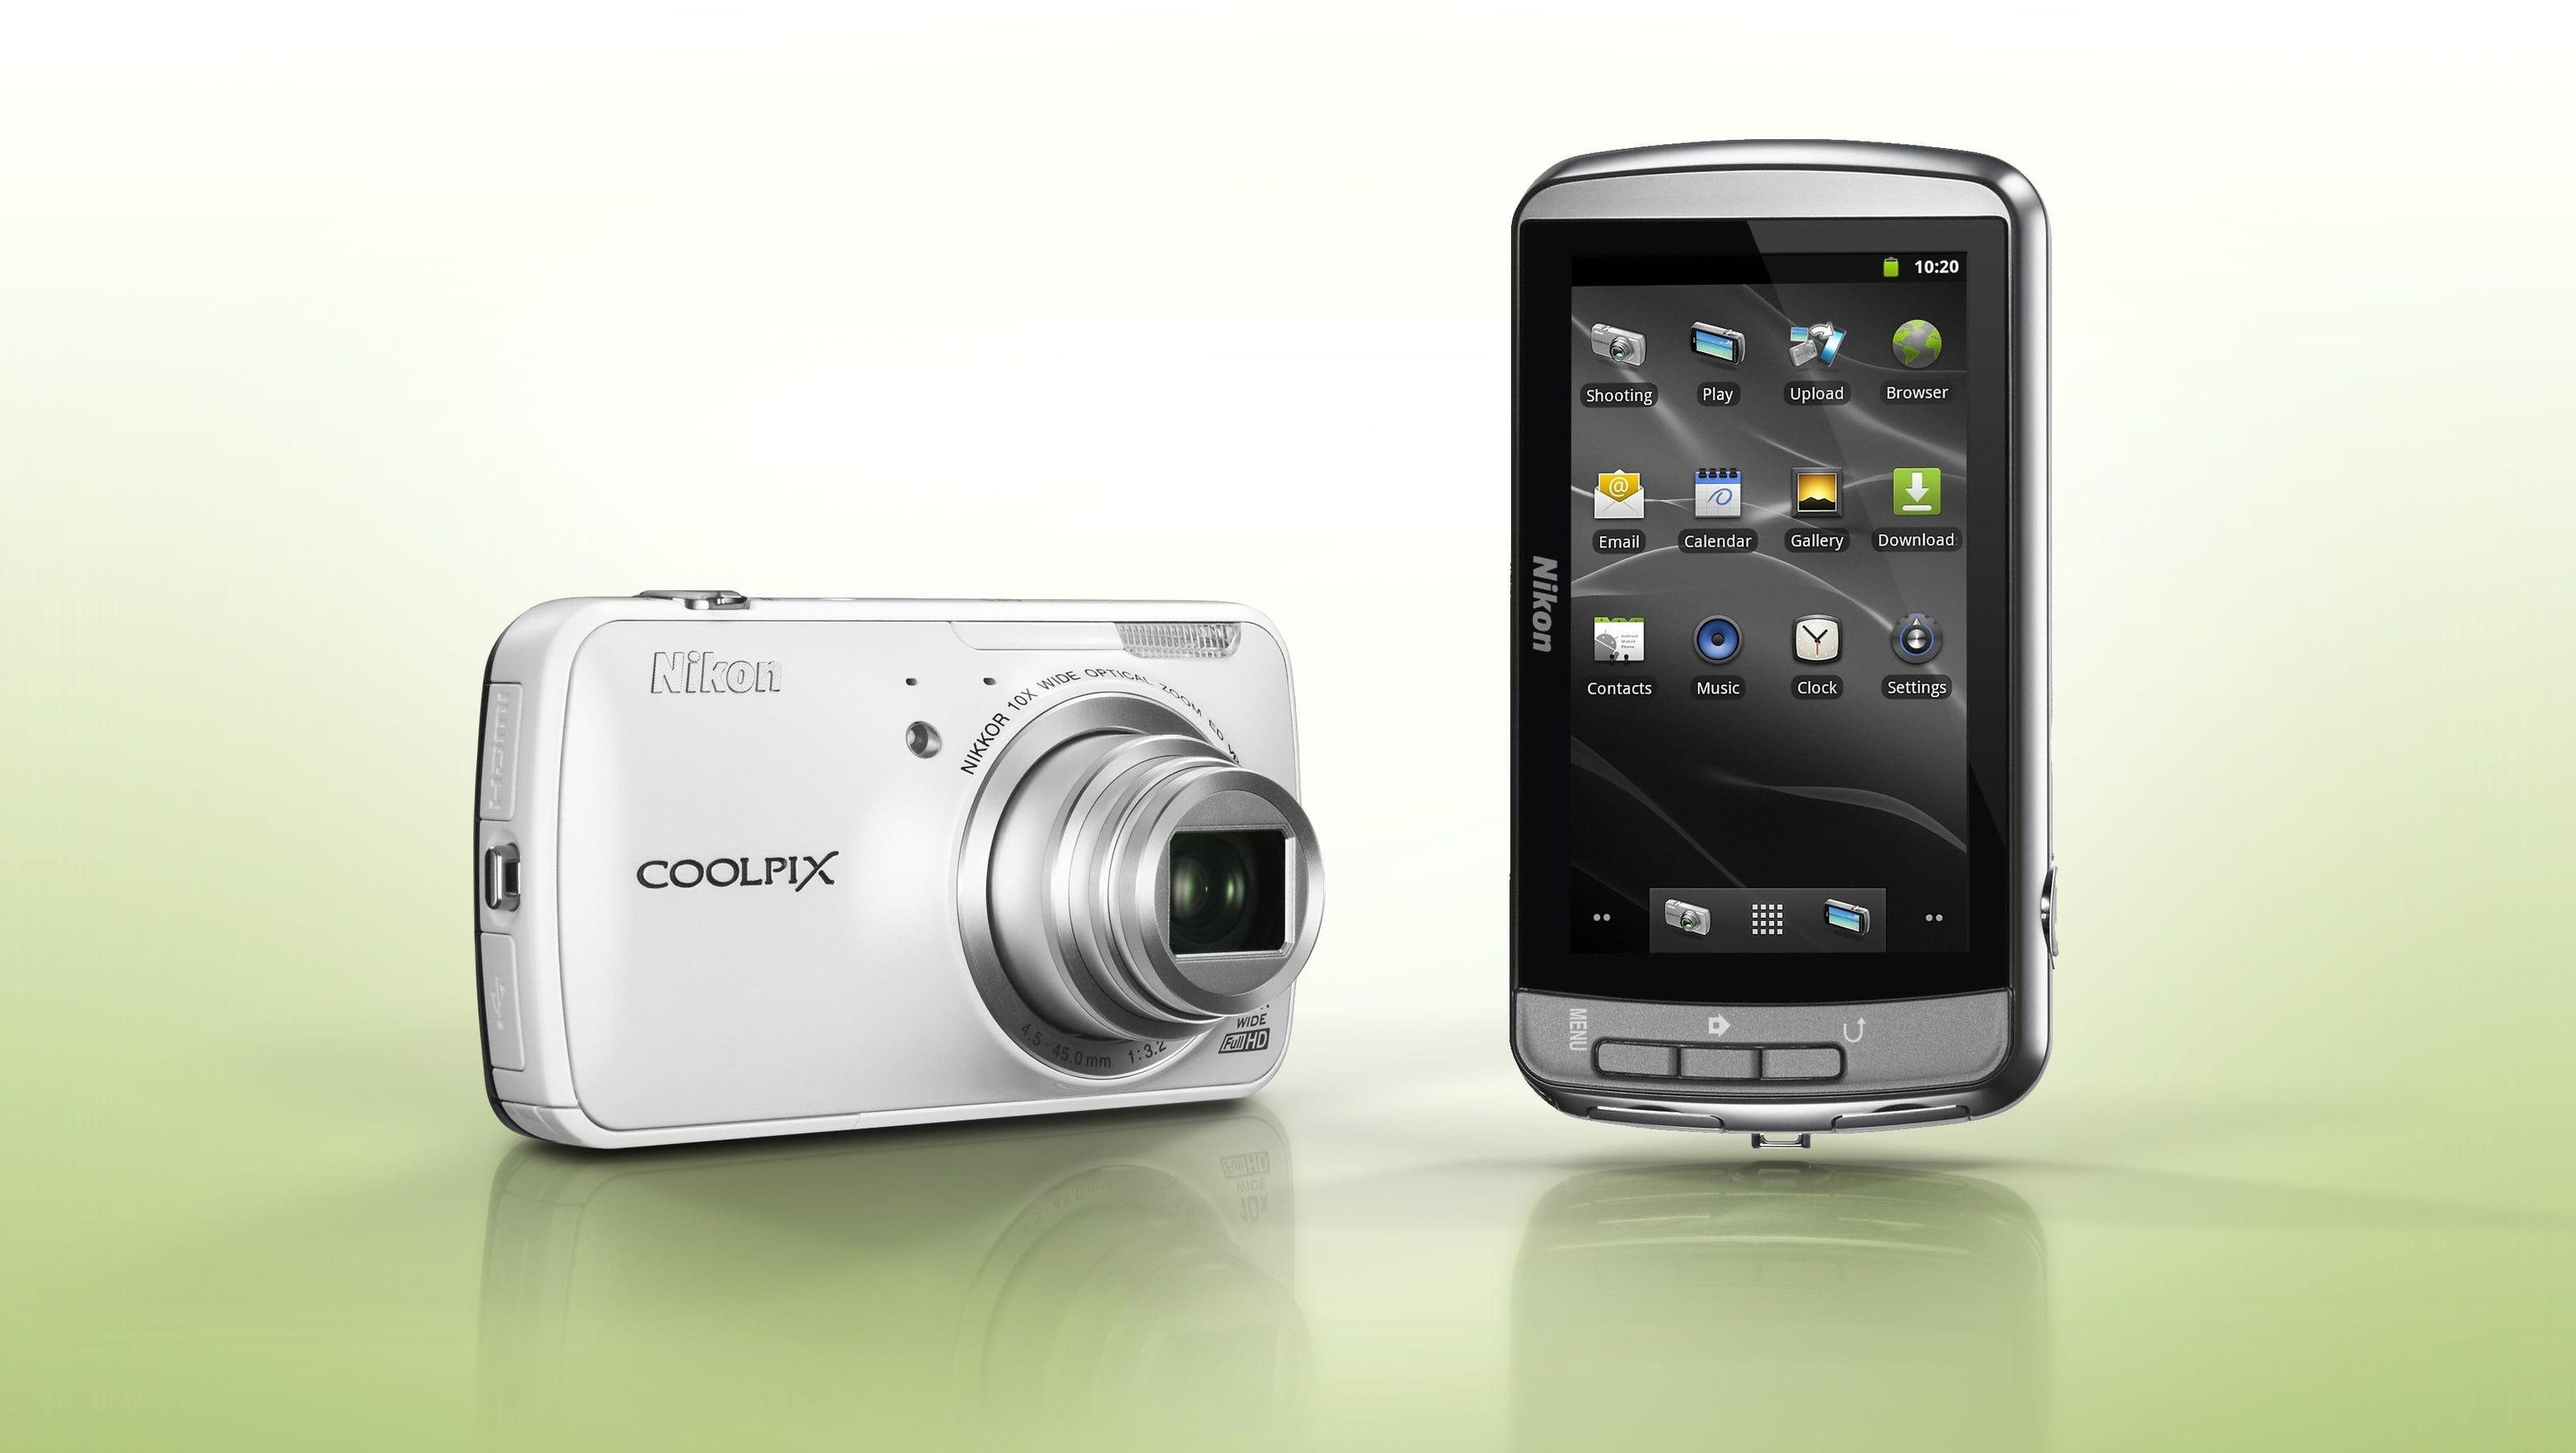 Gift Guide: Digital cameras change to beat smartphones